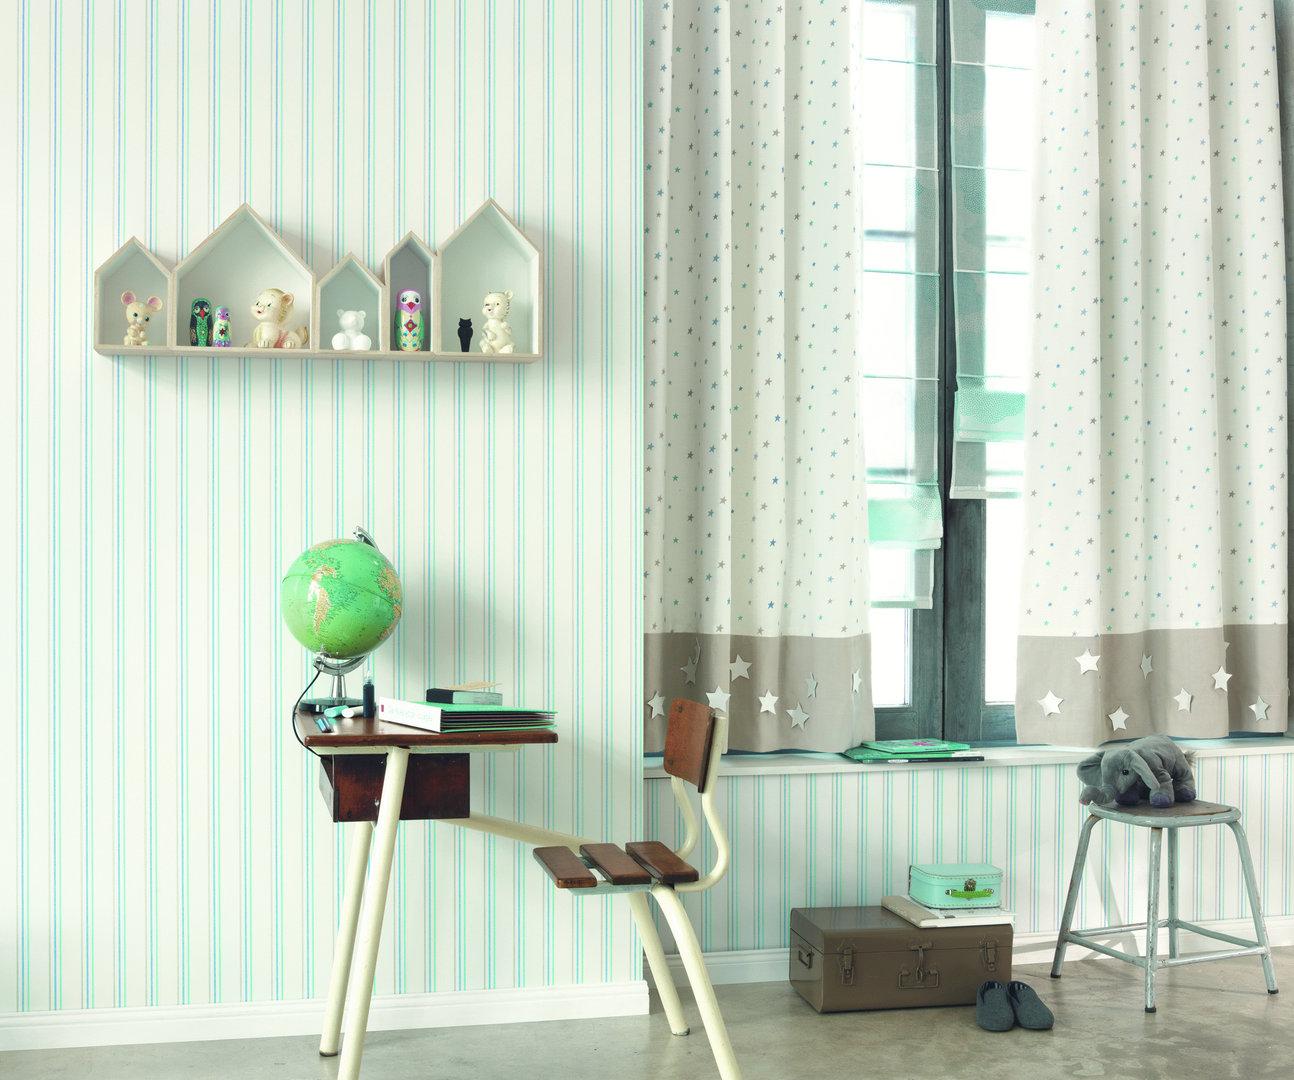 Papel pintado rayas turquesa amarillo y gris boutique - Papel pintado turquesa ...